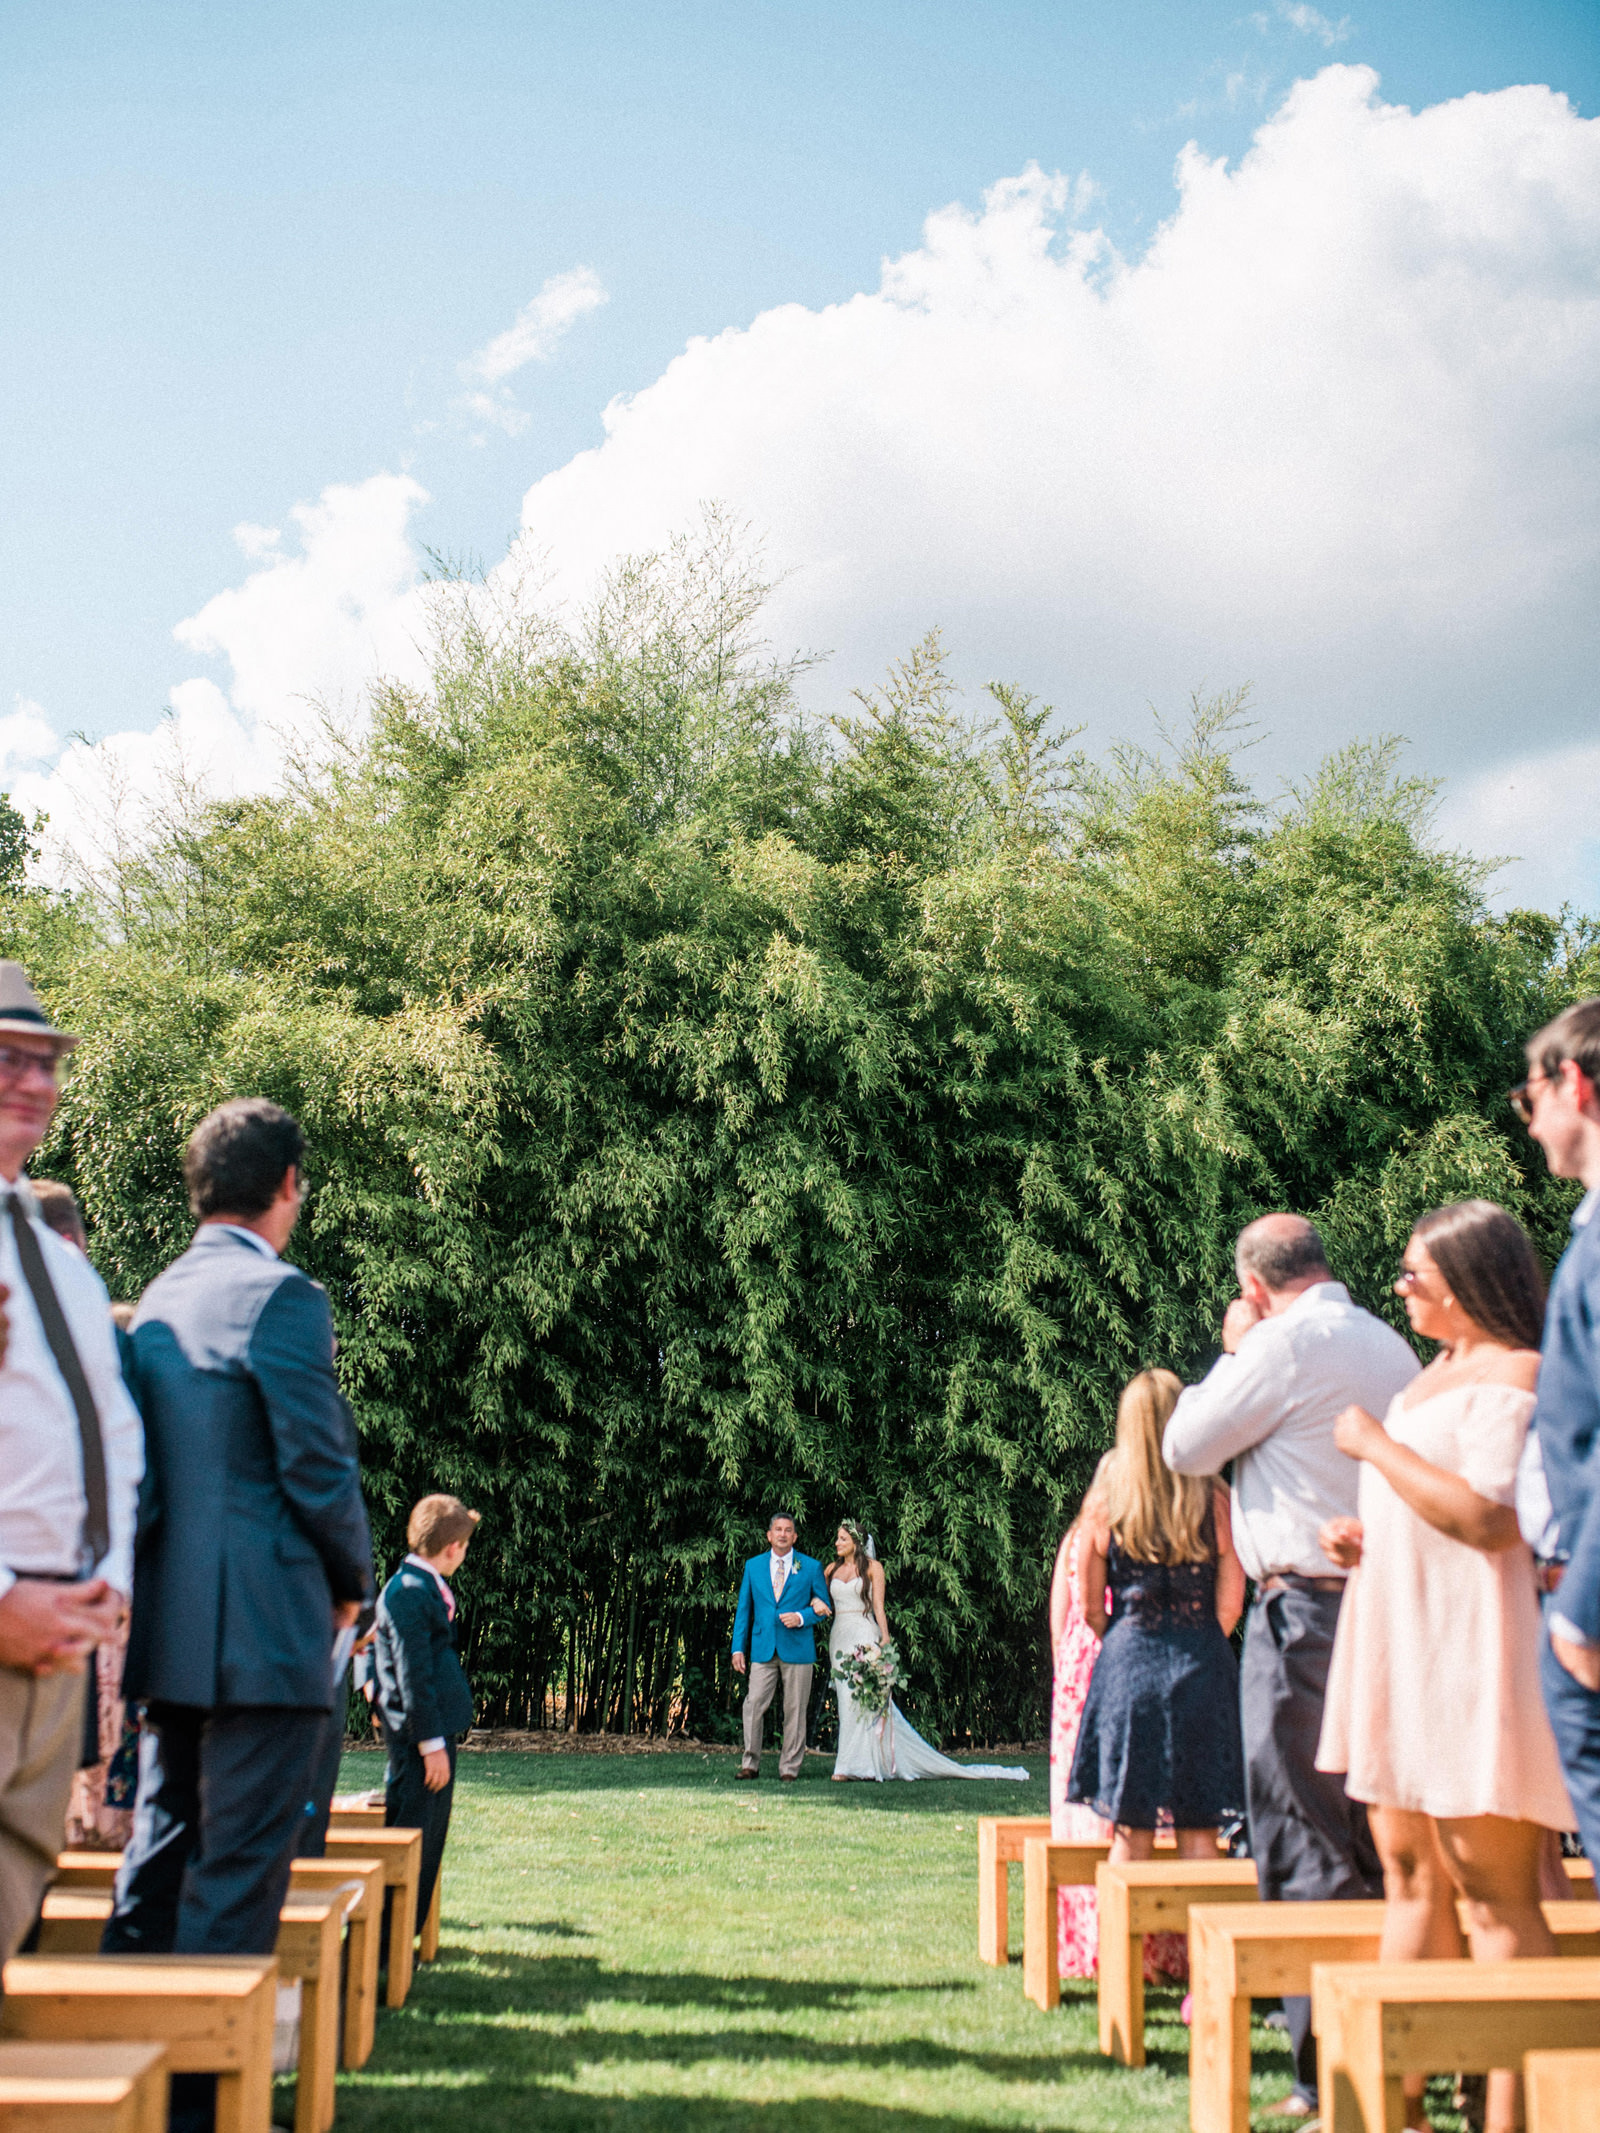 037-woodinville-lavendar-farm-wedding-with-golden-glowy-photos.jpg